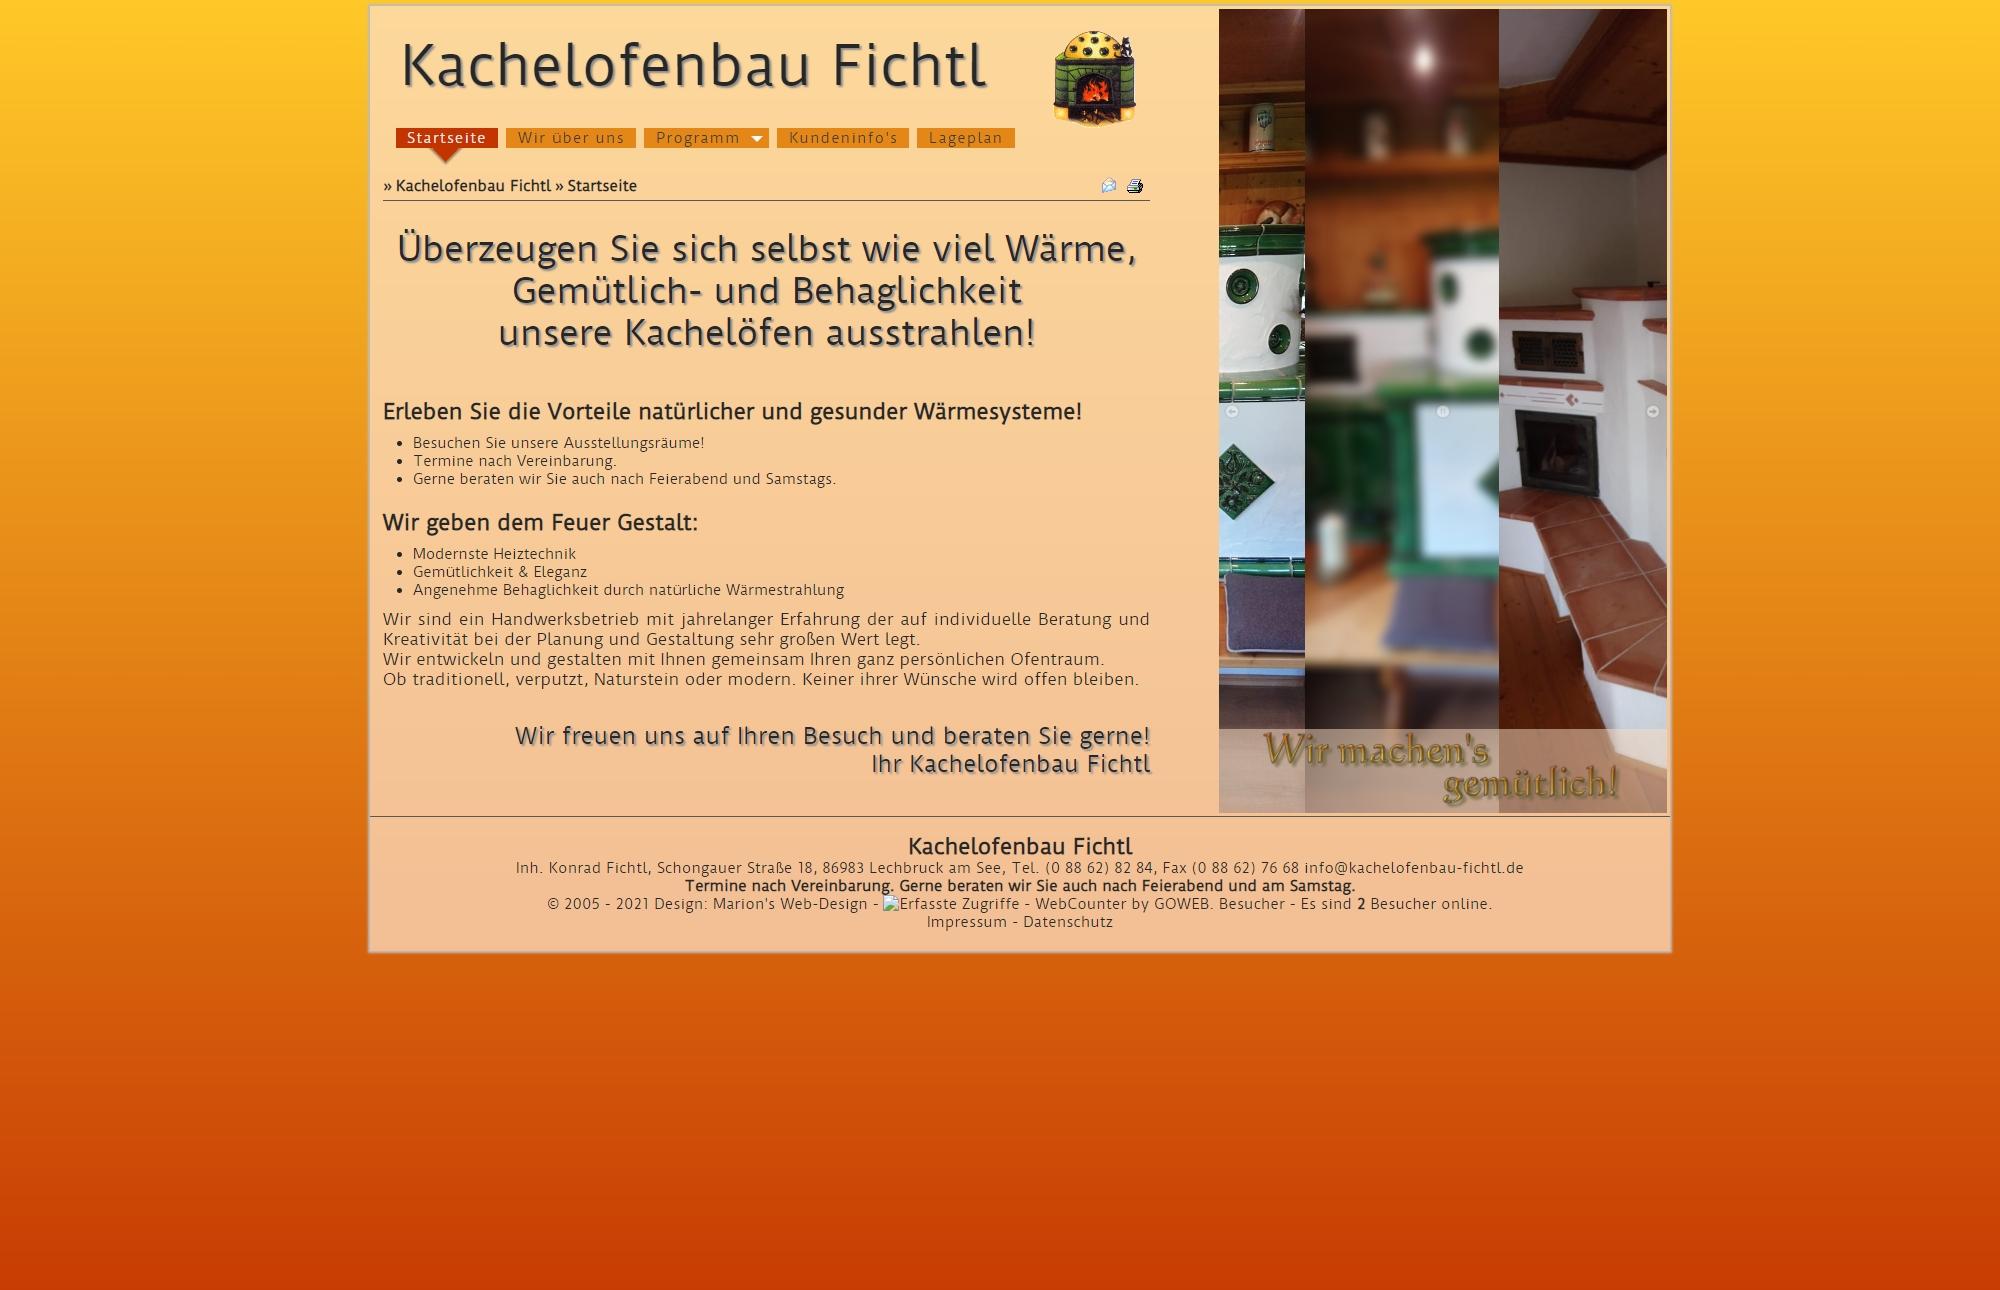 Kachelofenbau Fichtl, Lechbruck